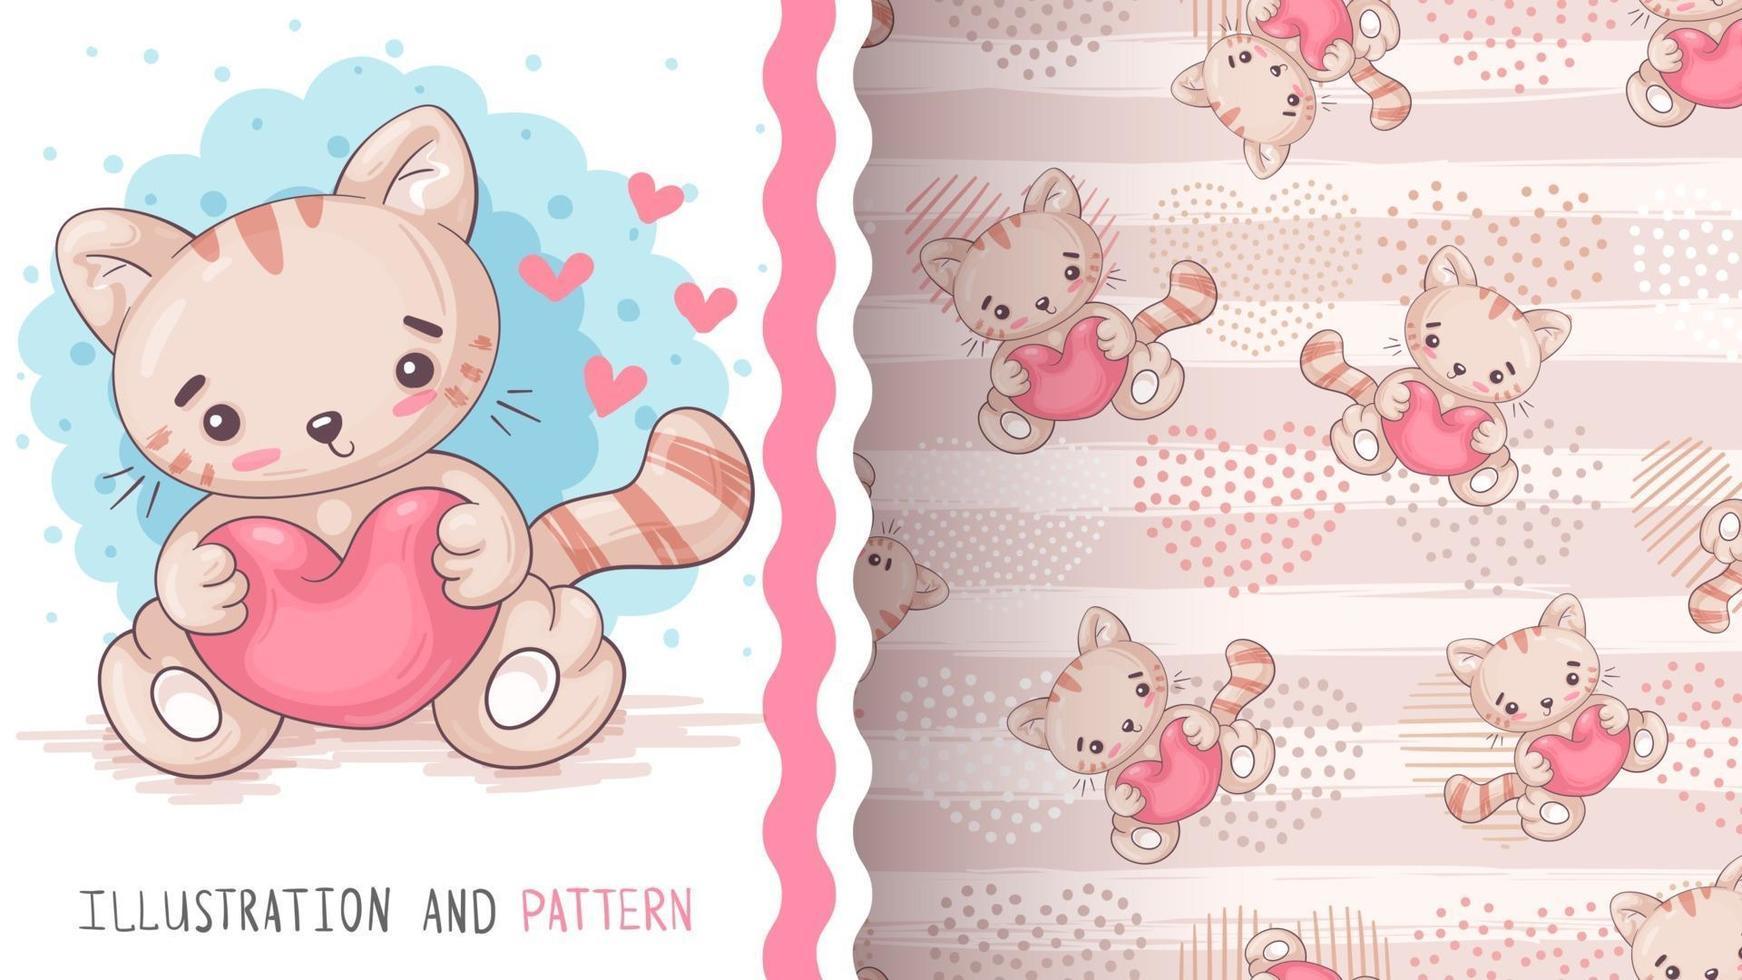 Childish cartoon character animal cat with heart vector